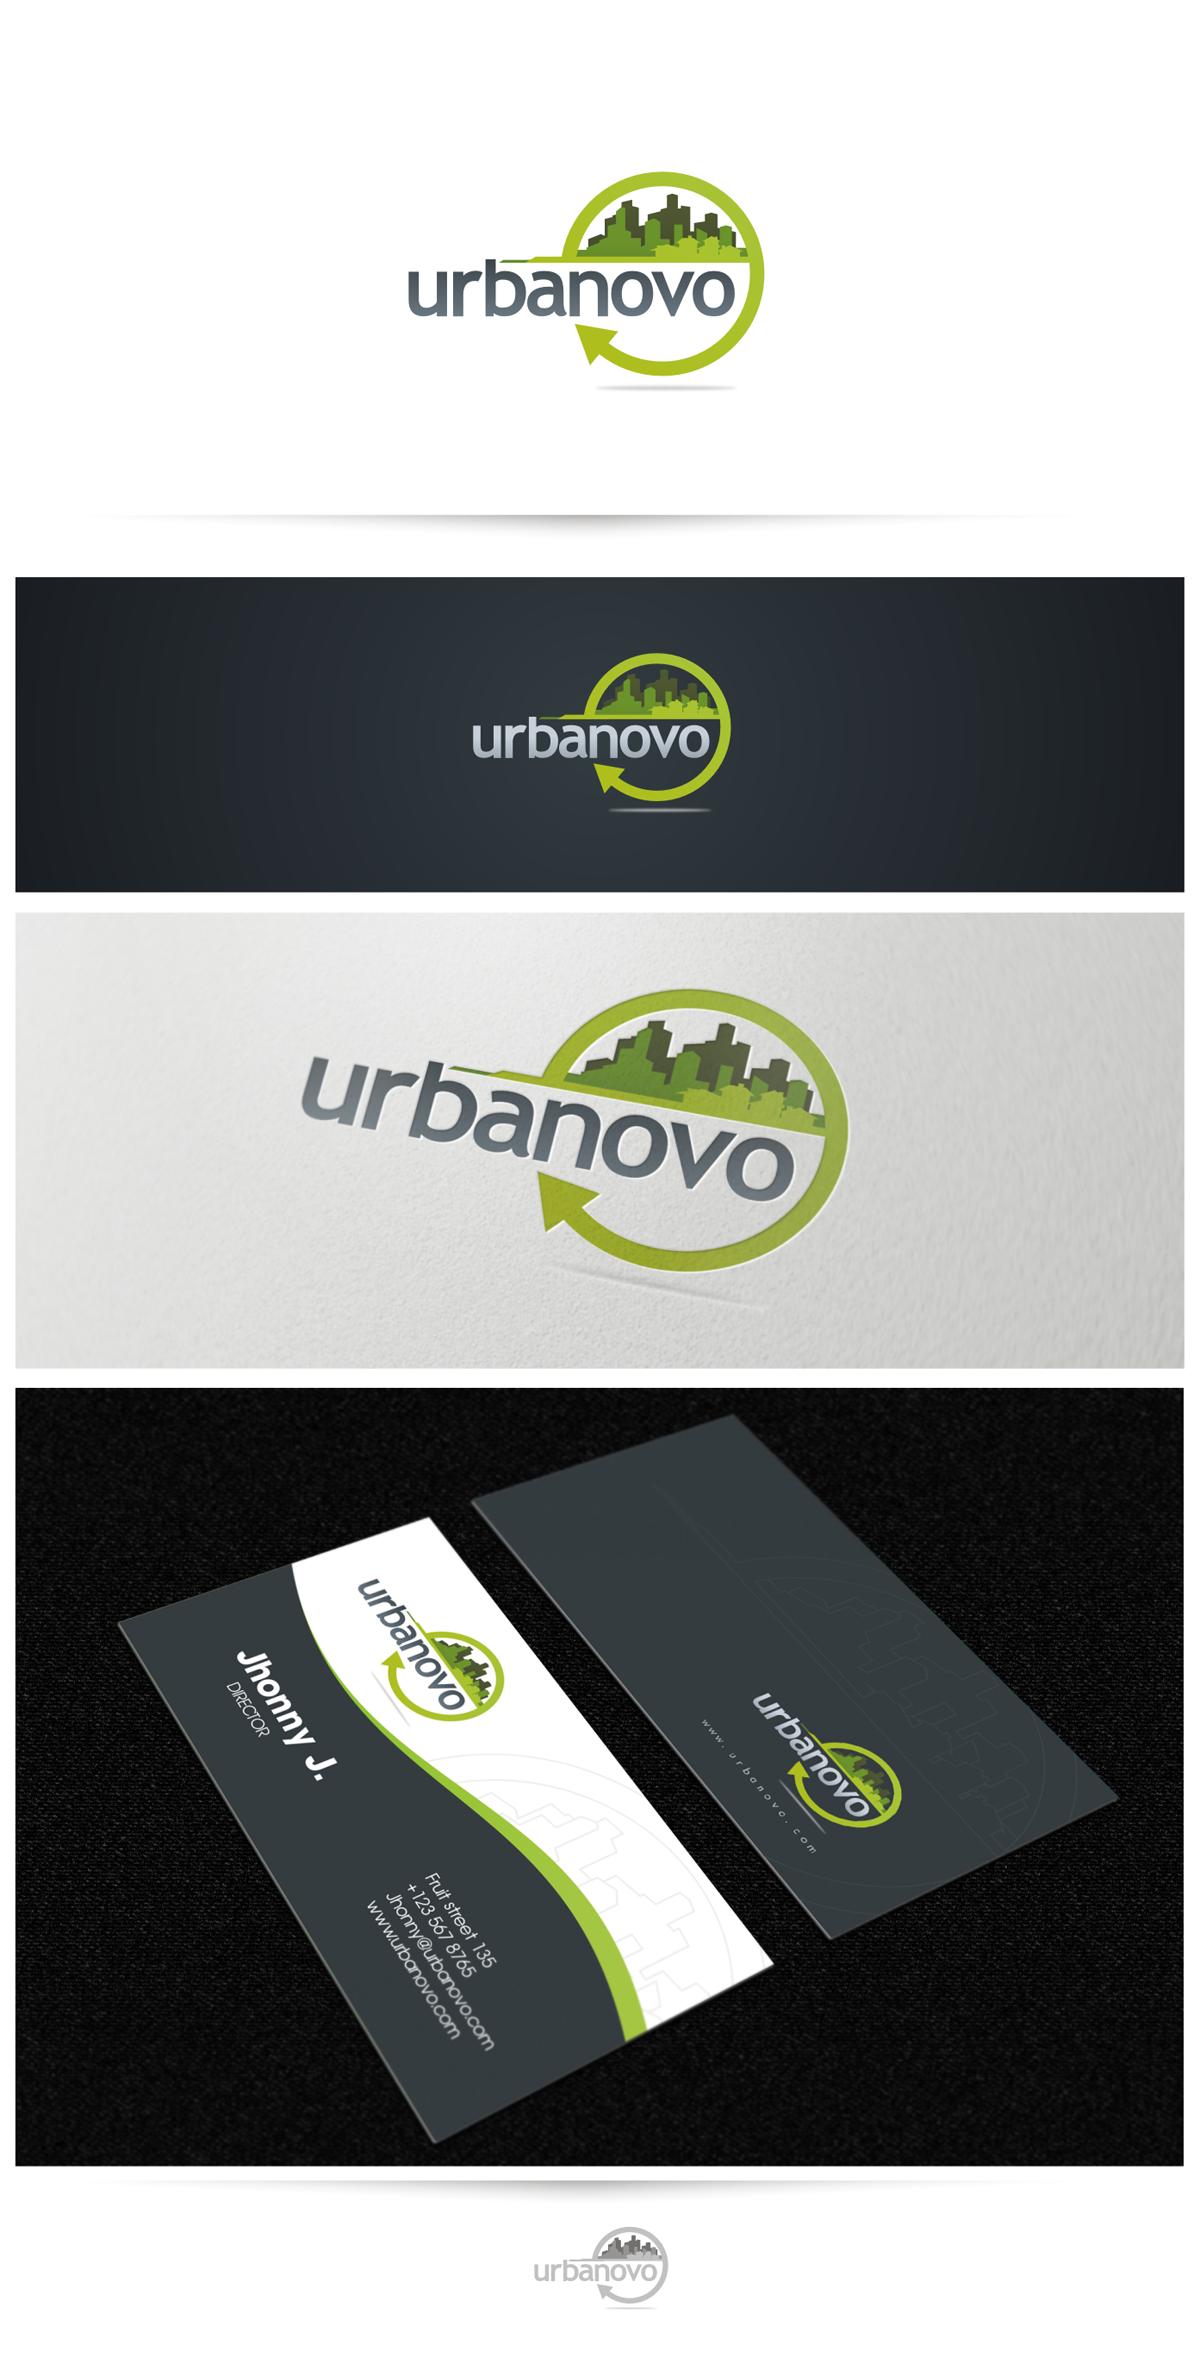 New logo wanted for urbanovo